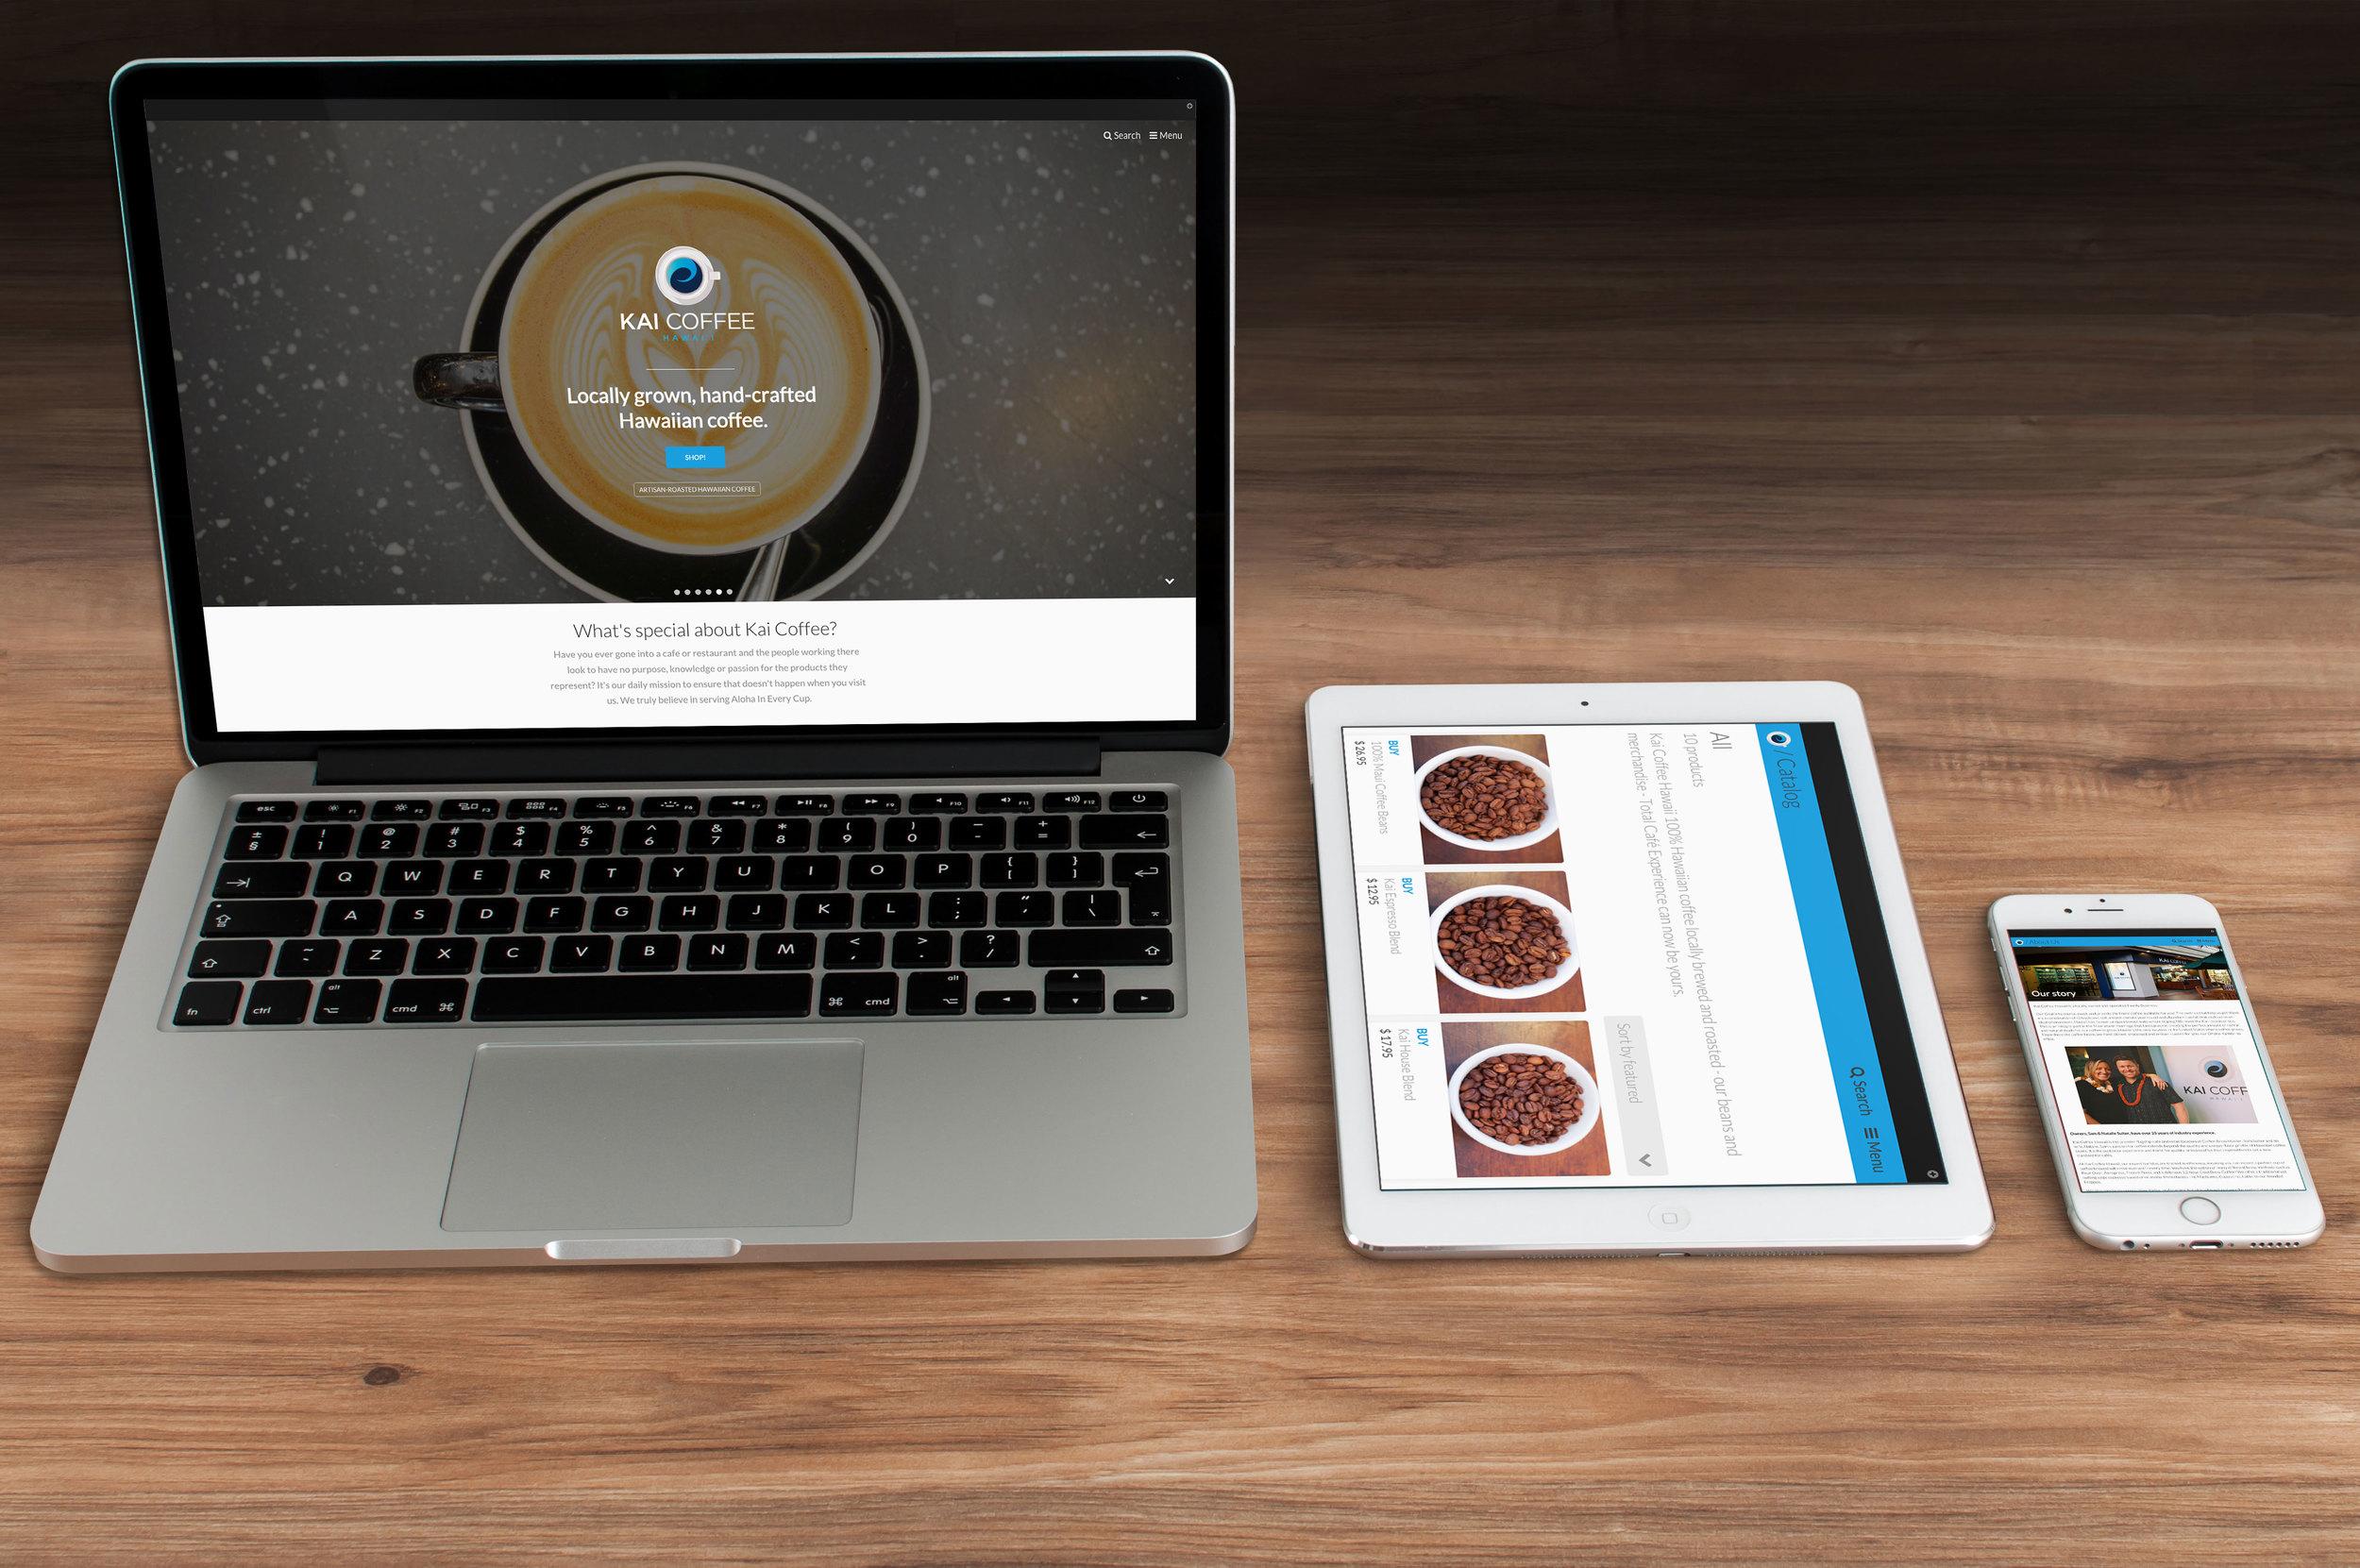 luzod-design-co-kai-coffee-hawaii-2.jpg